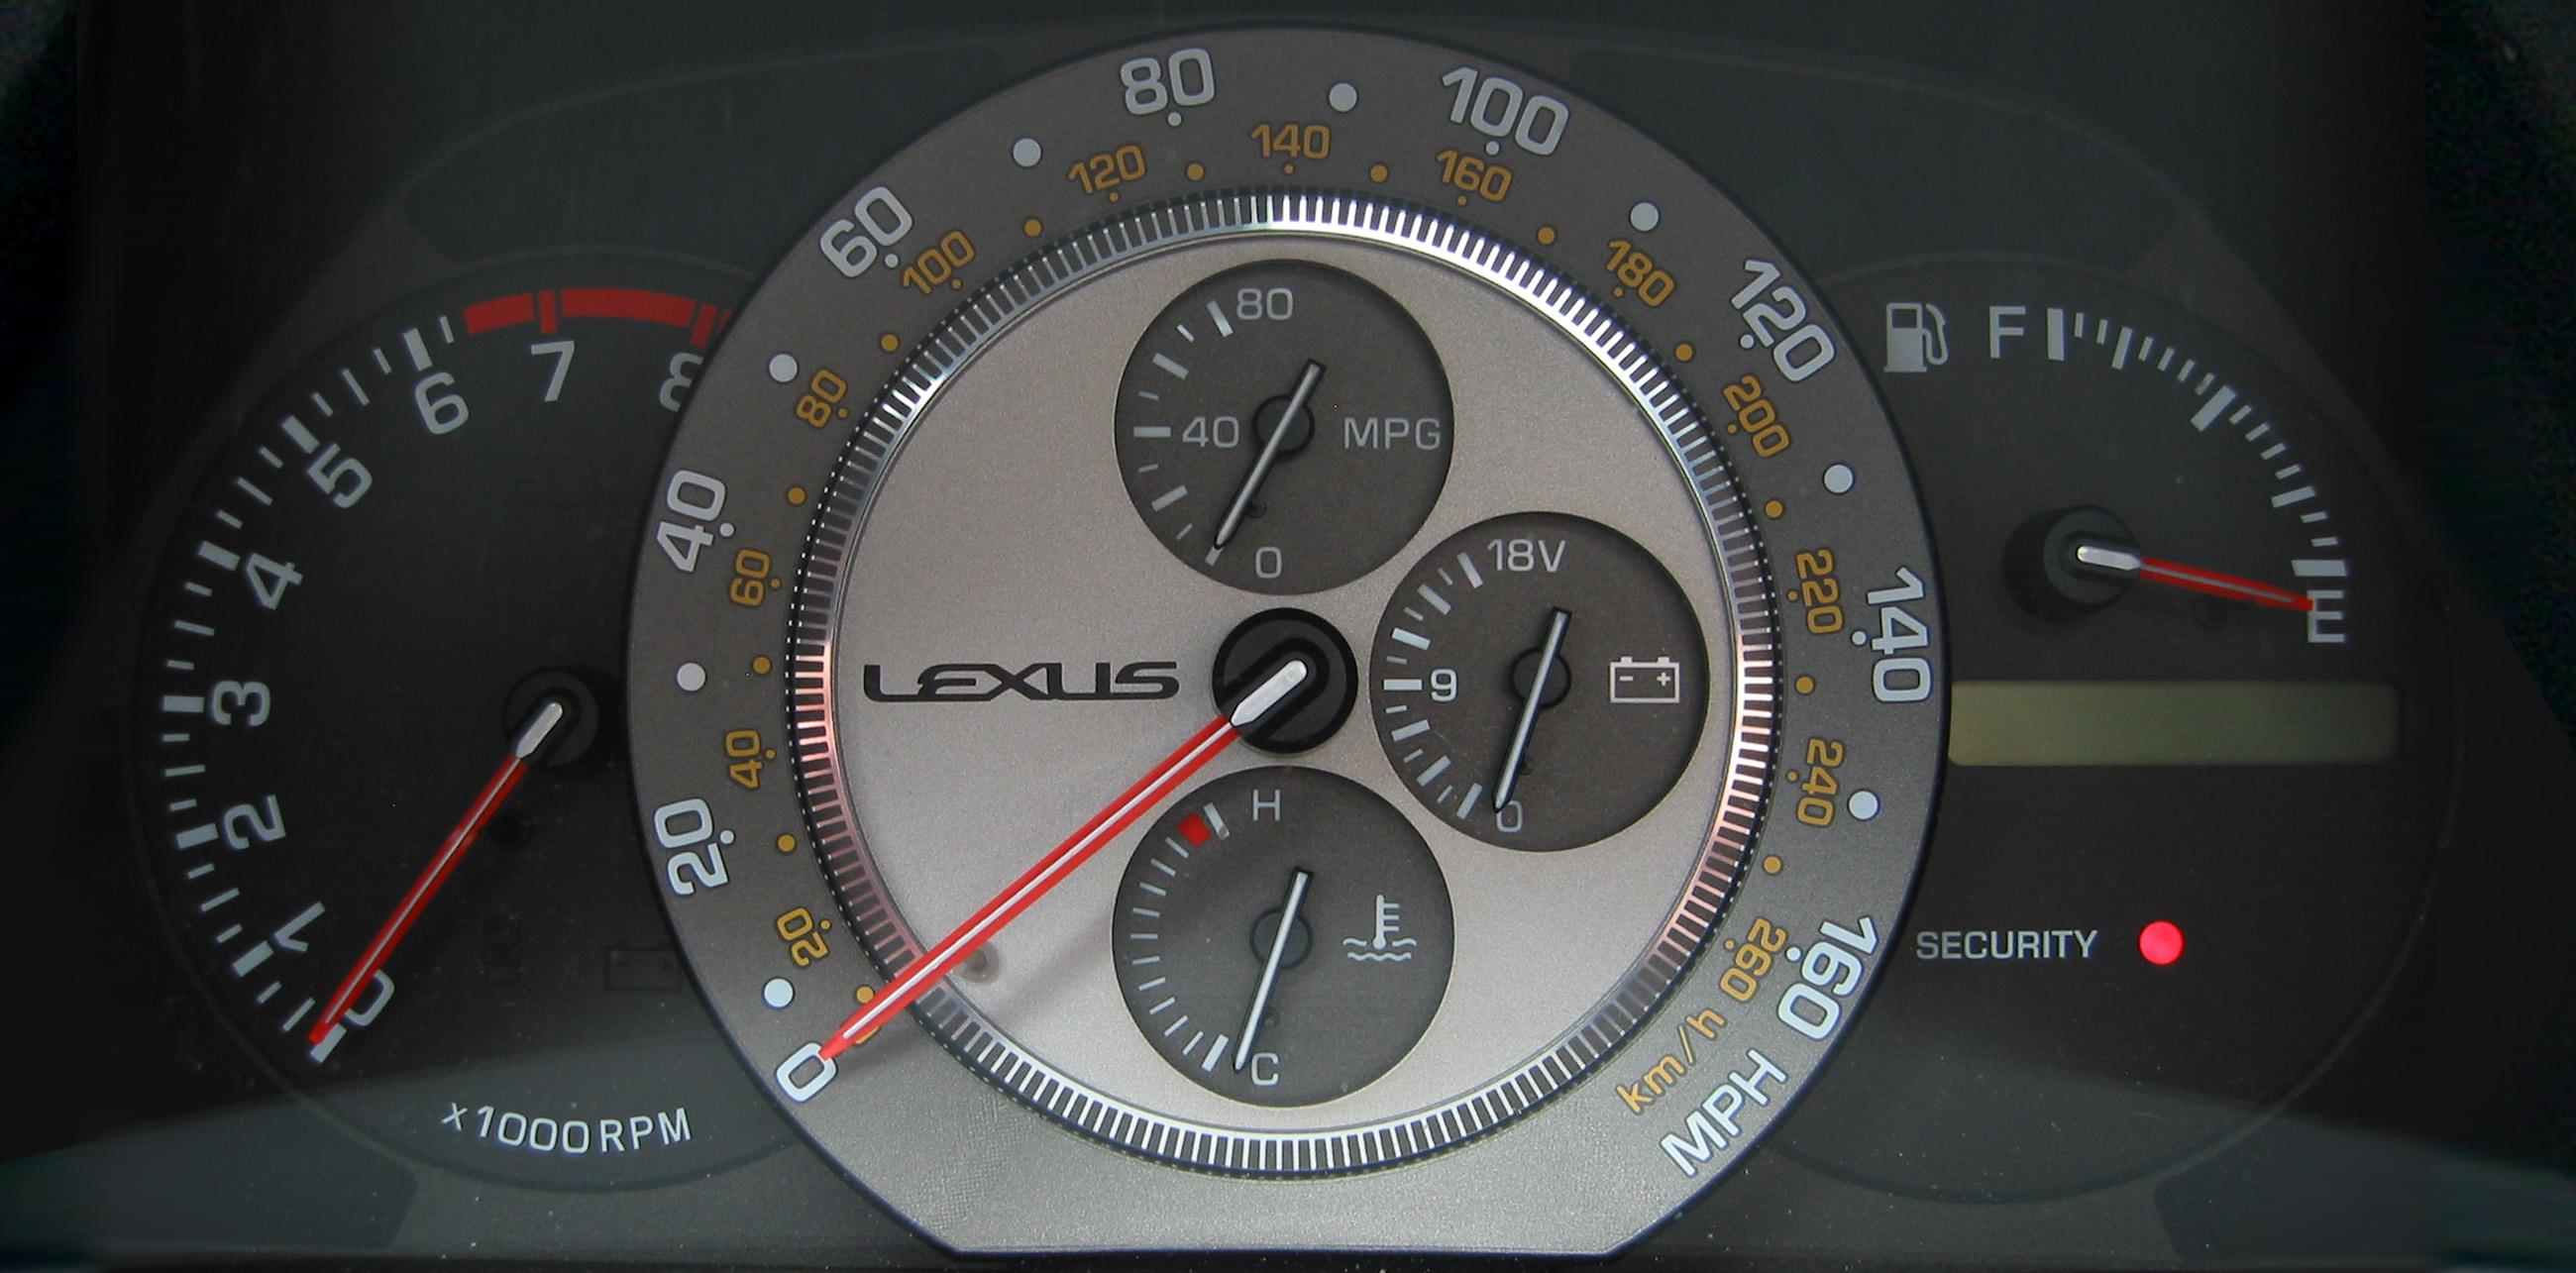 File:Lexus IS 300 instrument panel jpg - Wikimedia Commons